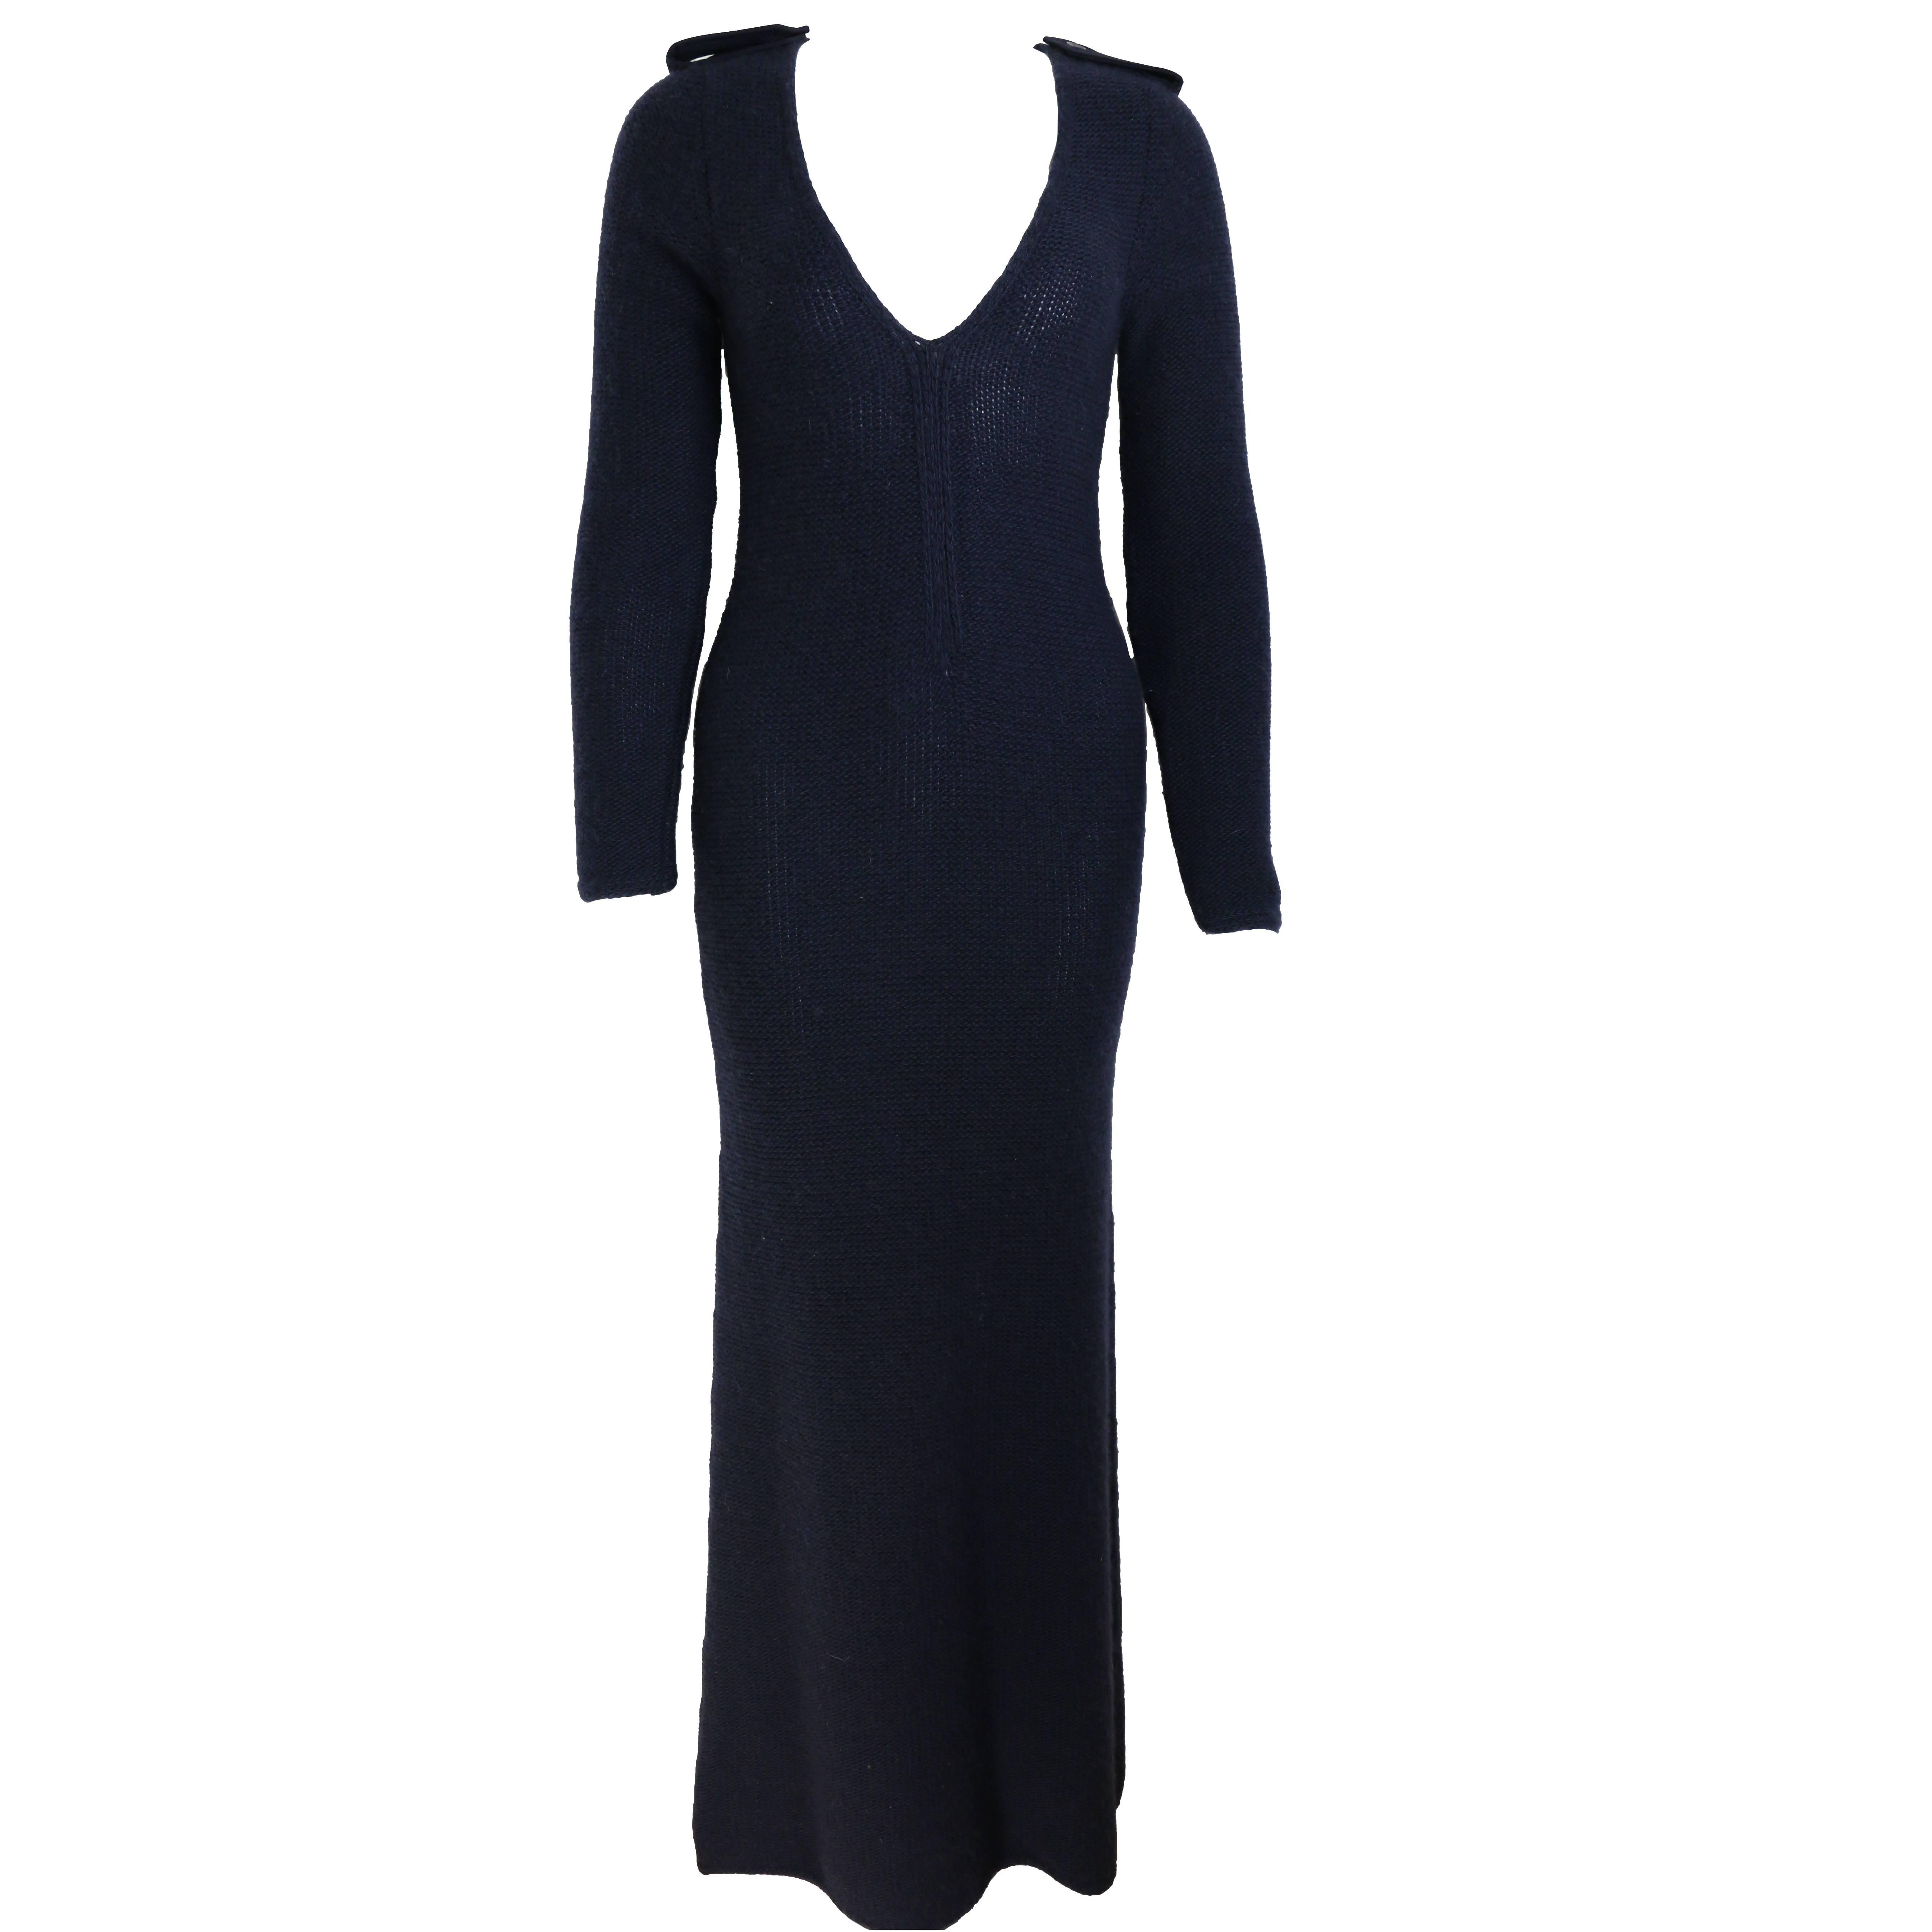 e1ea5c1e7 Gucci by Tom Ford Black Maxi Dress For Sale at 1stdibs